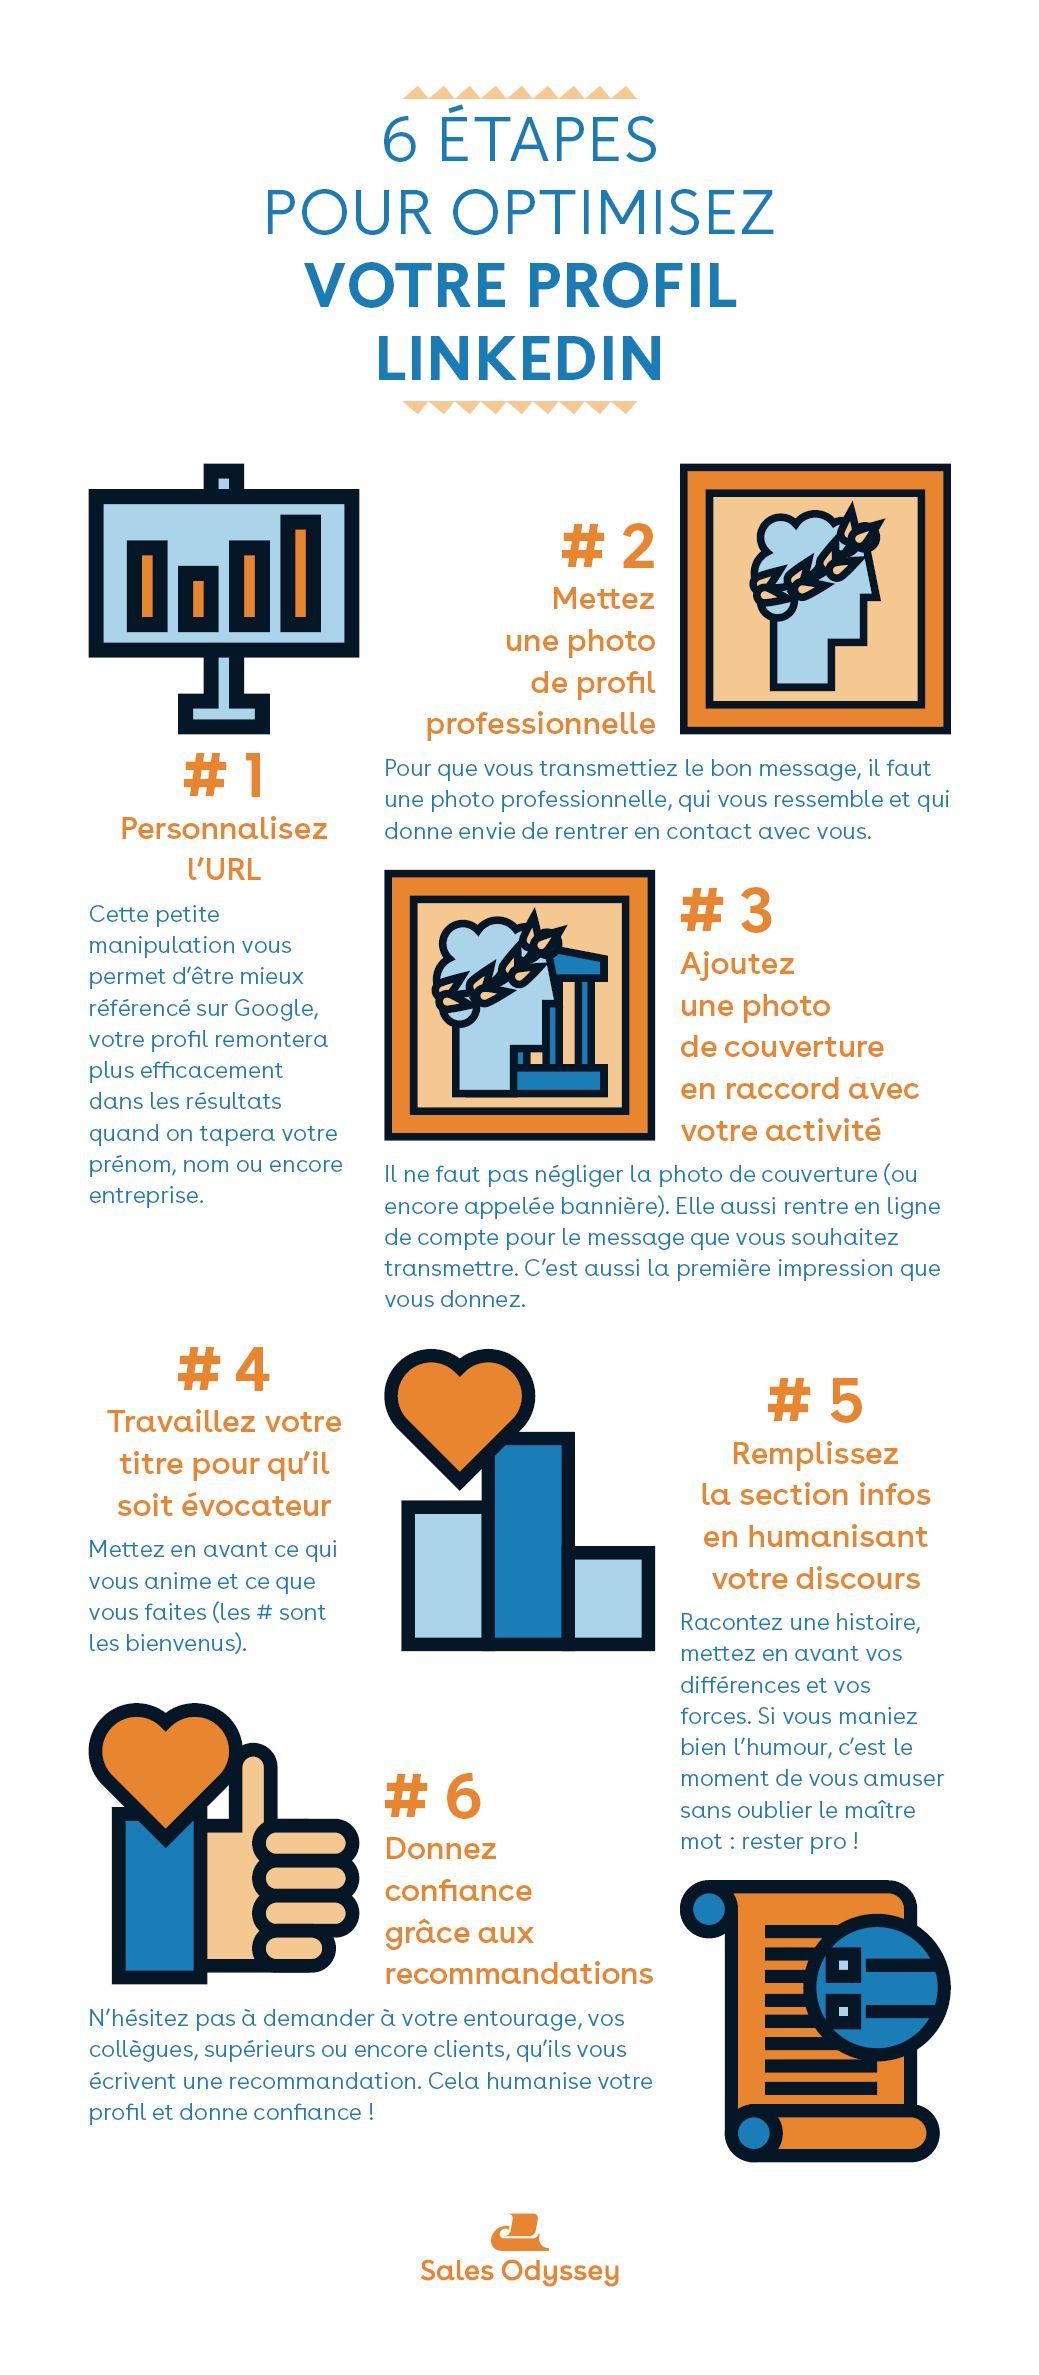 6 Etapes Pour Optimiser Votre Profil Linkedin Photo Personnalise Photo Profil Marketing Digital